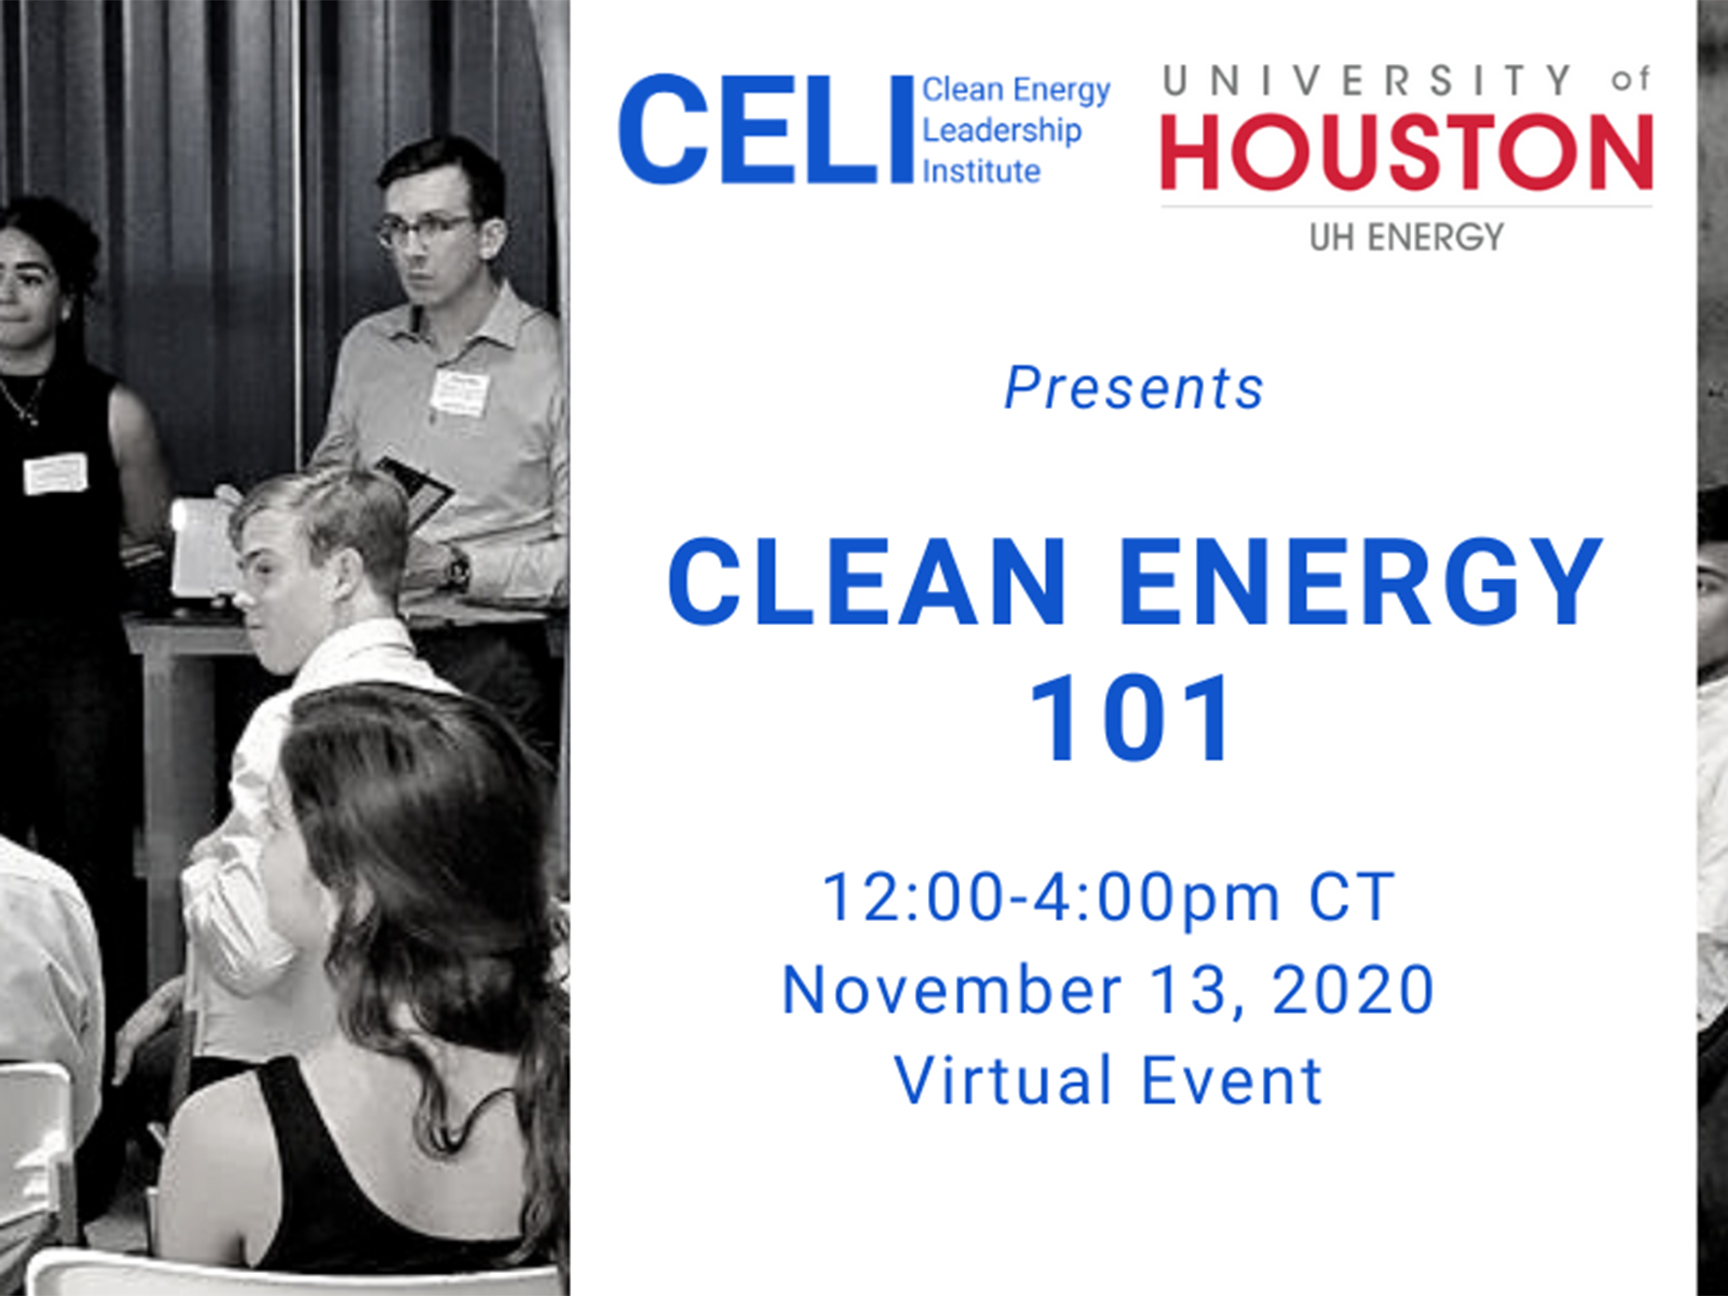 CELI's Clean Energy 101 Course Image